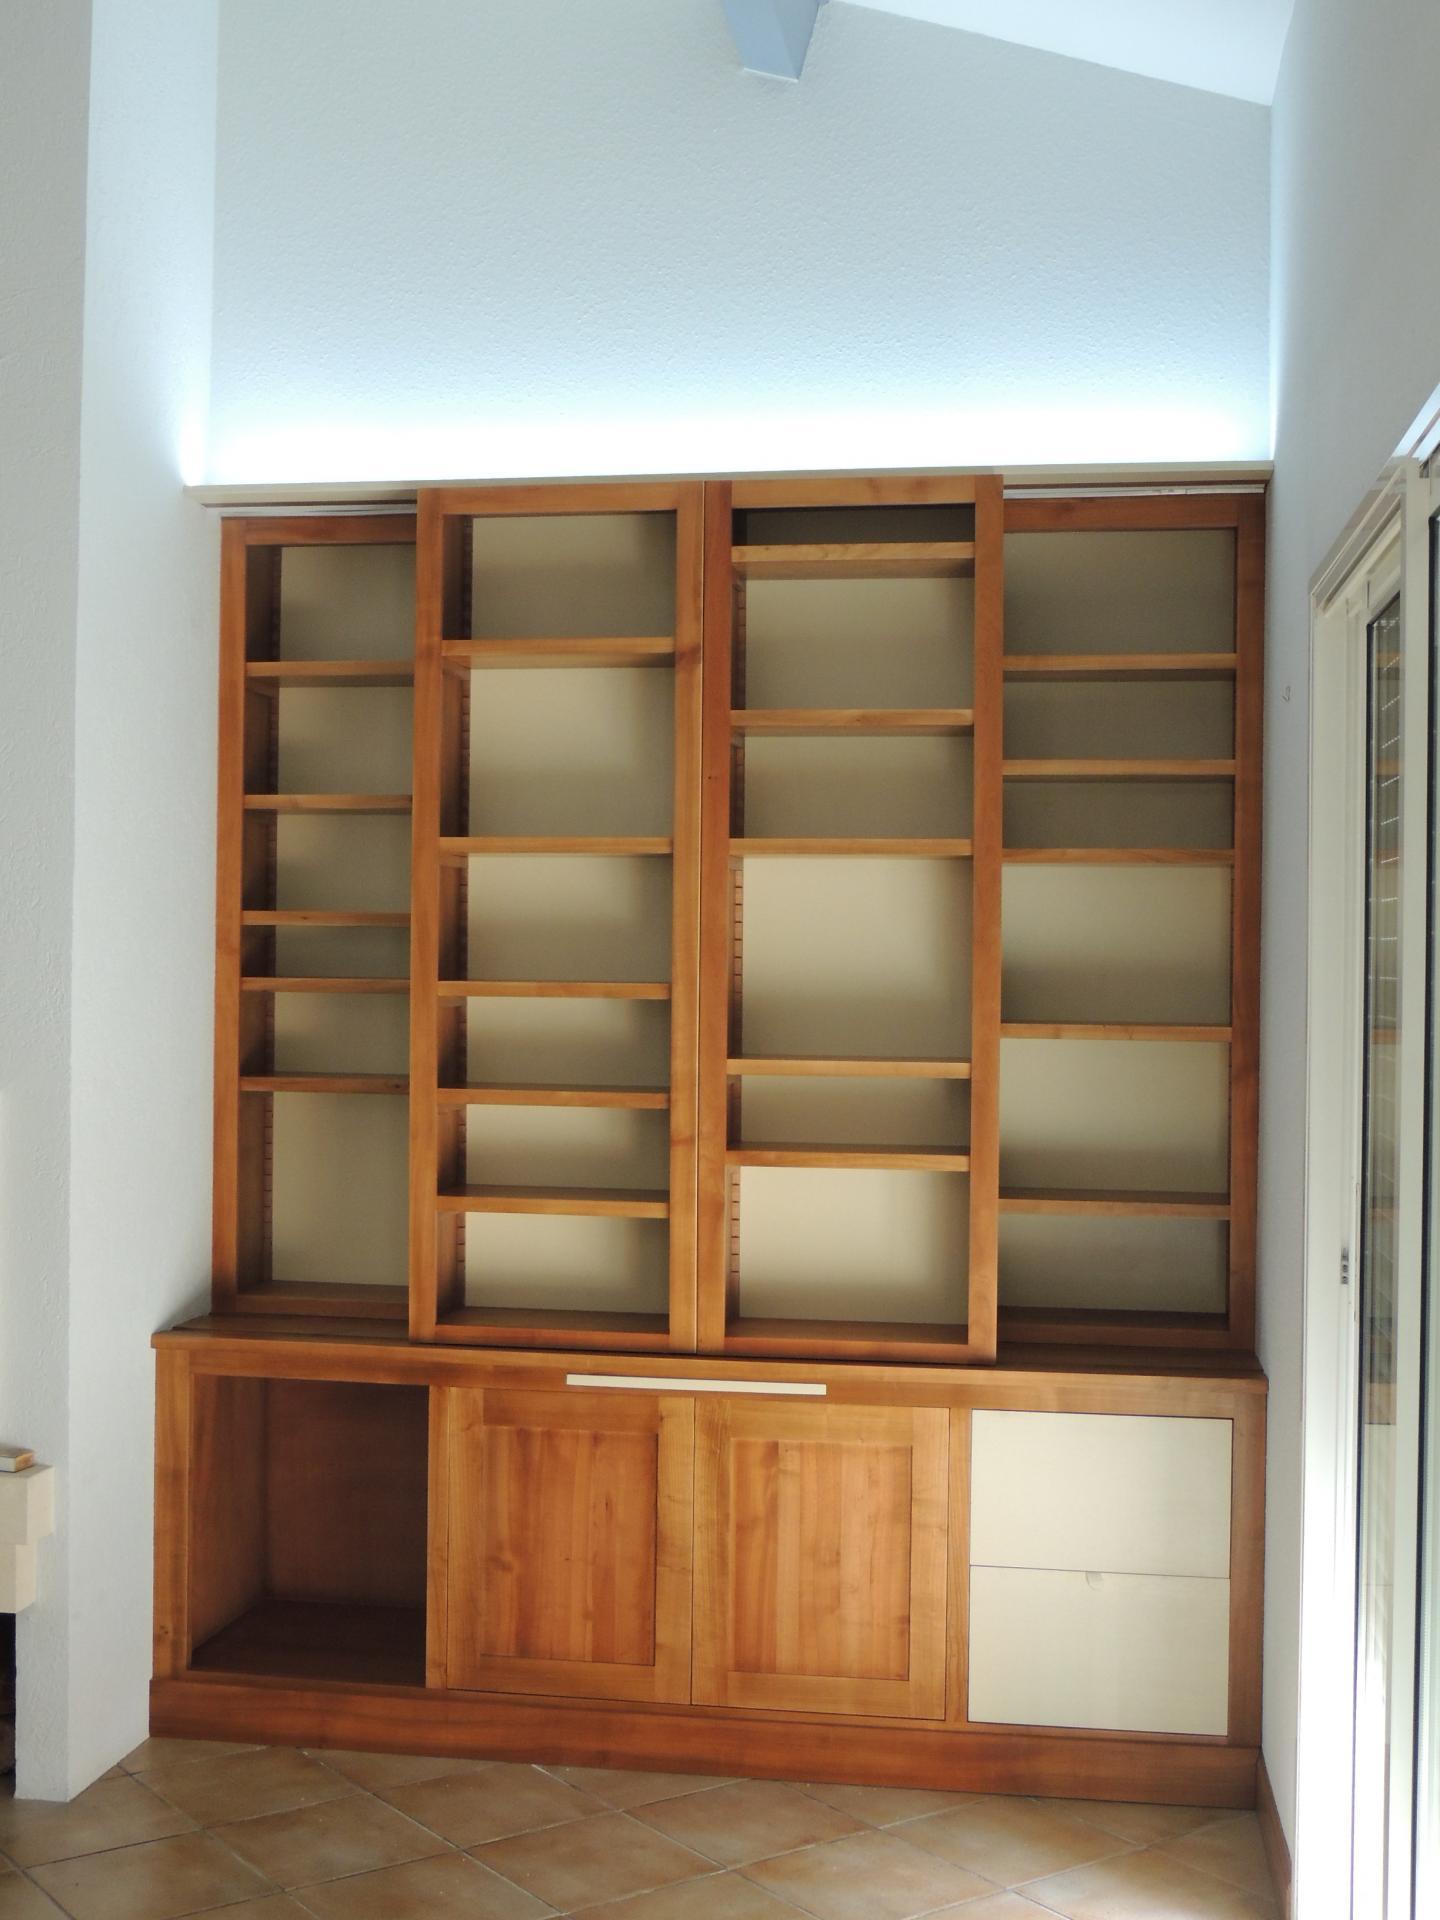 Bibliothèque merisier massif - www.ateliercannelle.com